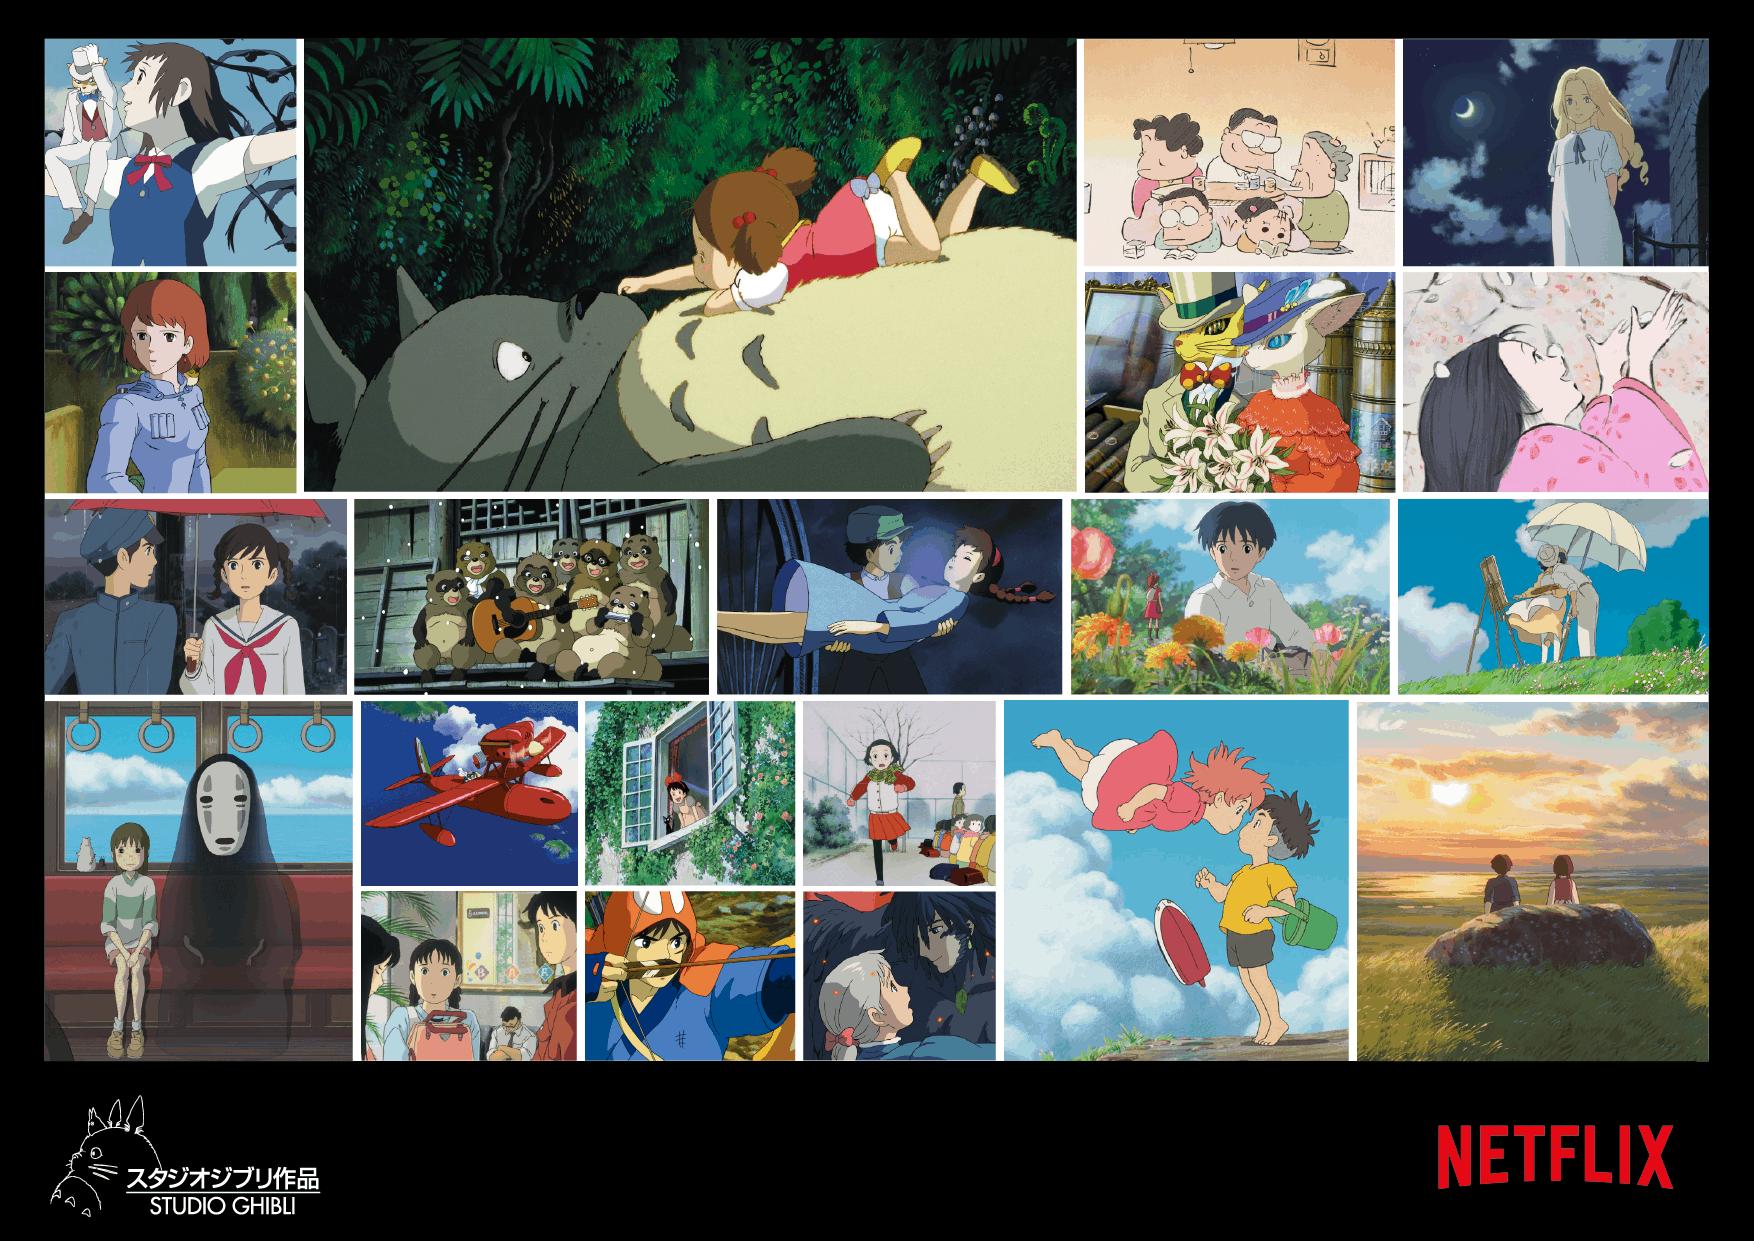 Studio Ghibli ในเน็ตฟลิกซ์